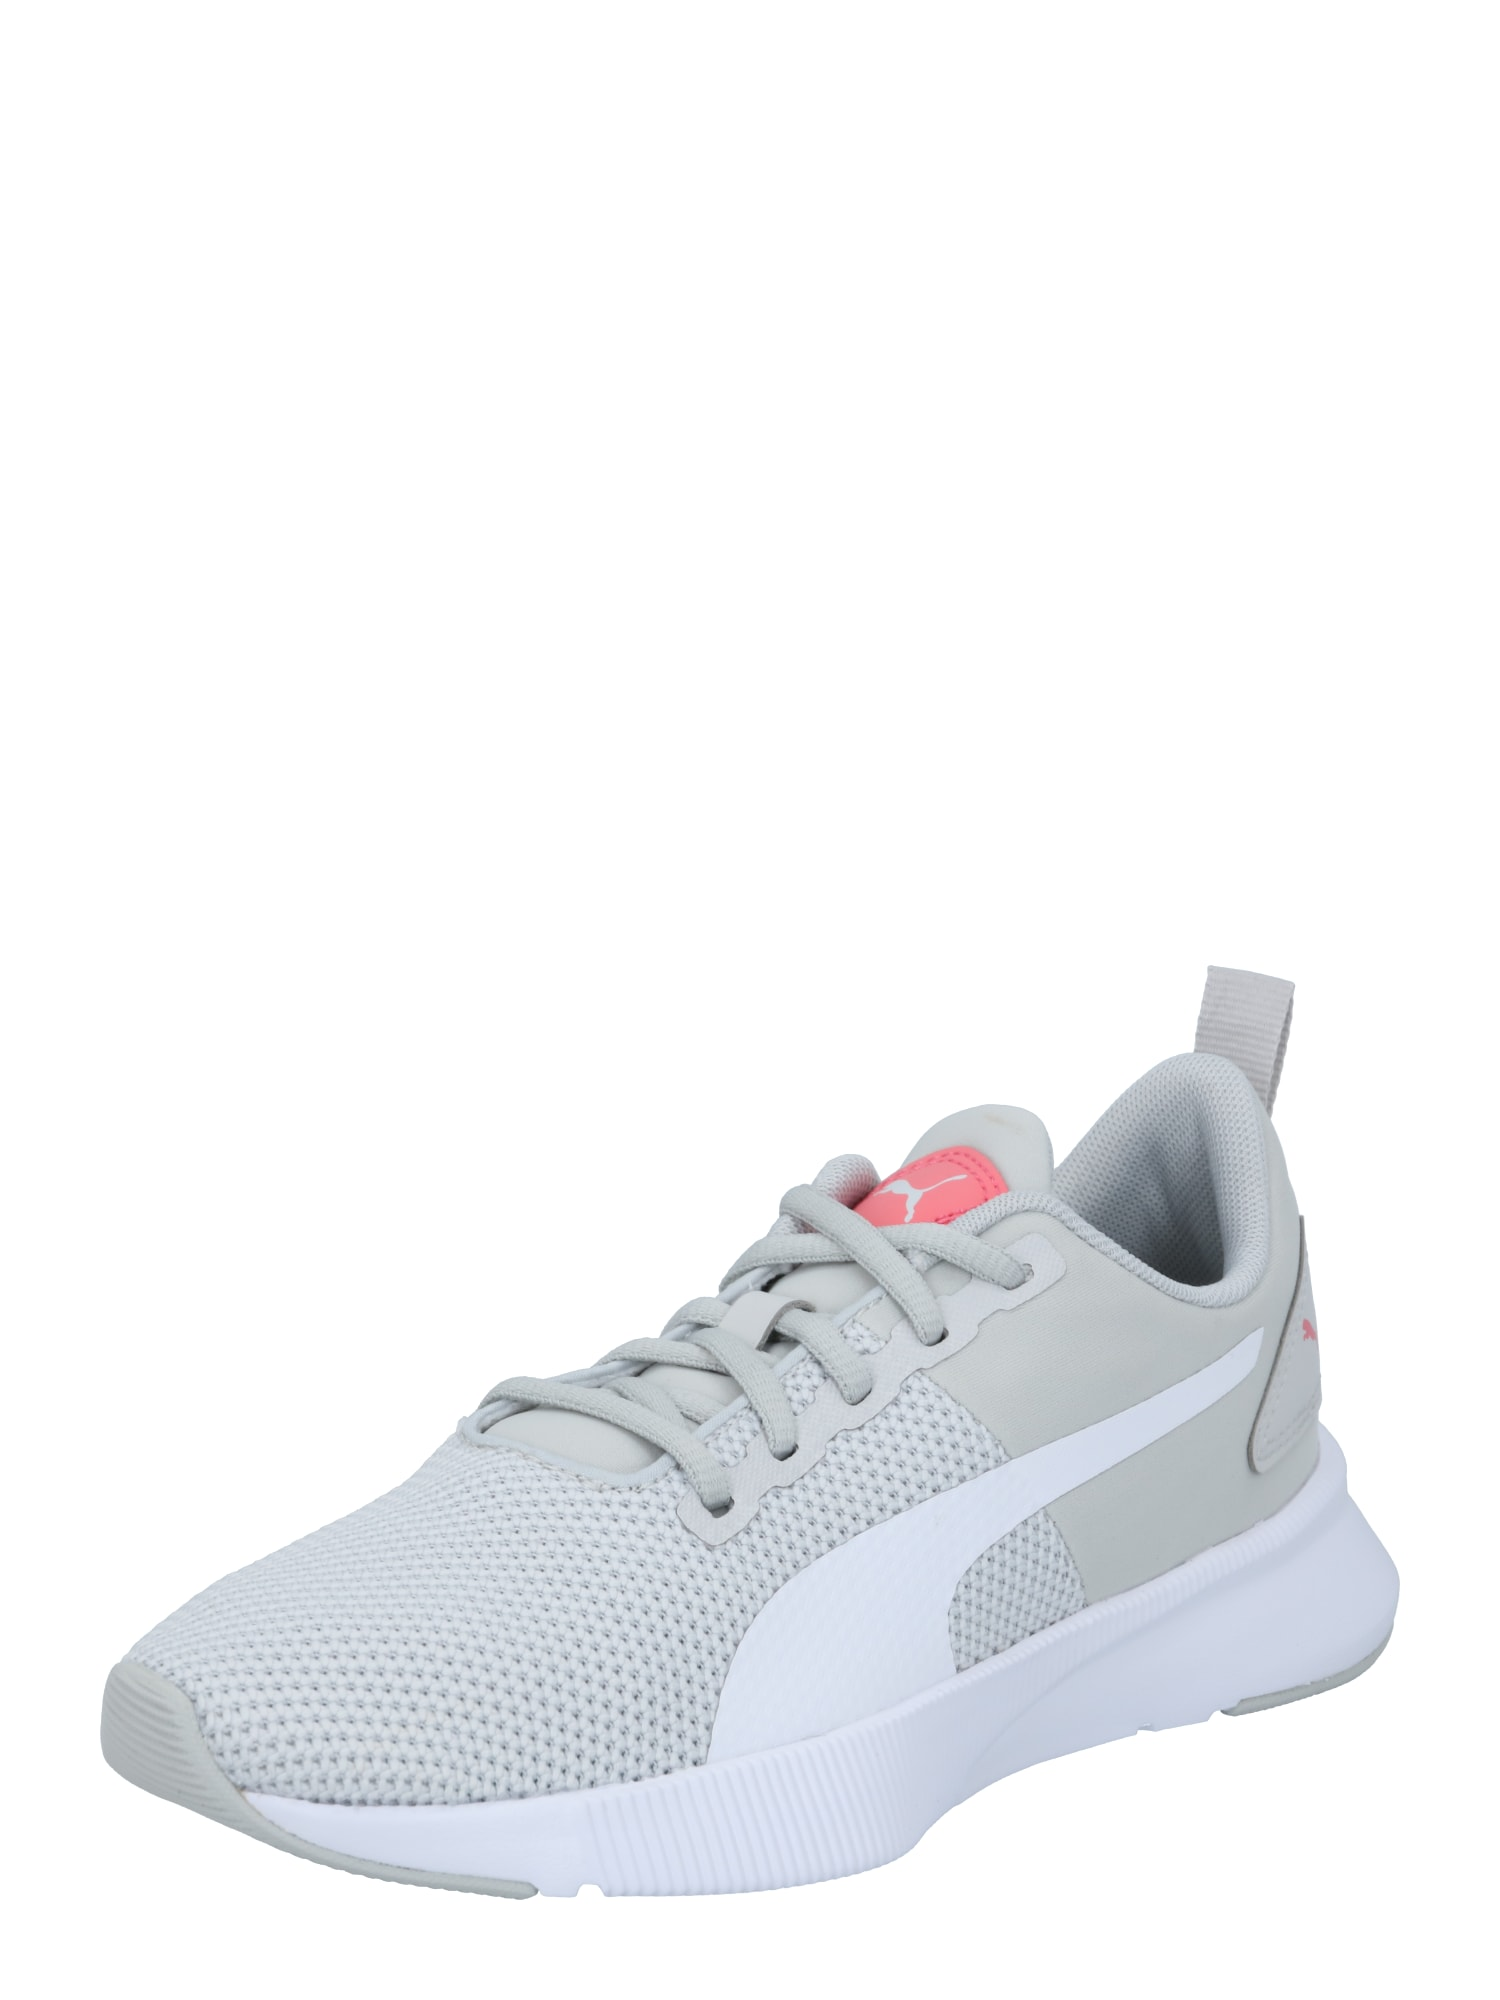 PUMA Sportiniai batai 'Flyer Runner Jr' balta / dūmų pilka / melionų spalva